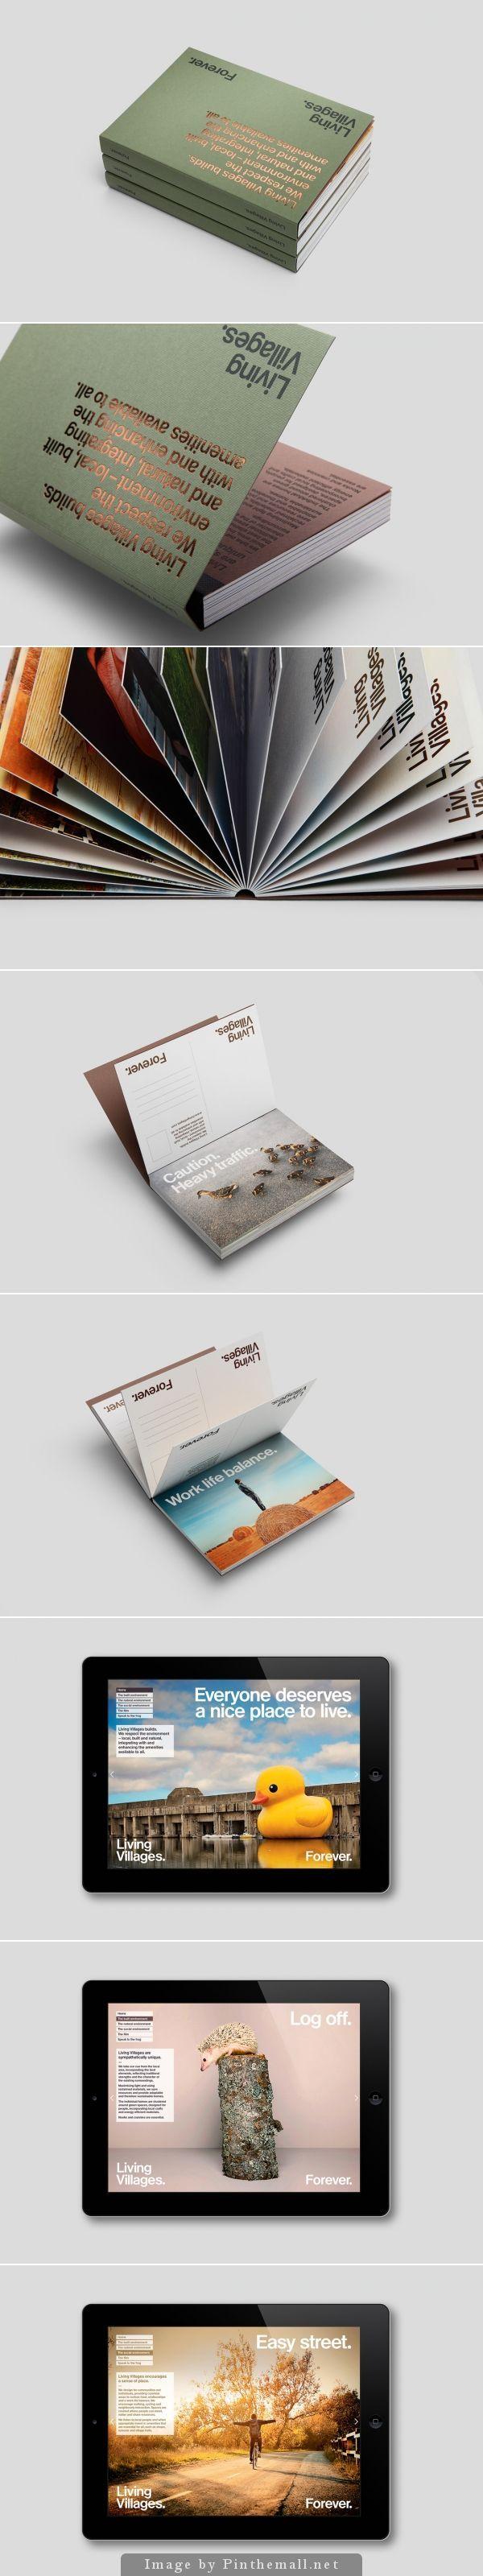 123 best brochure images on pinterest